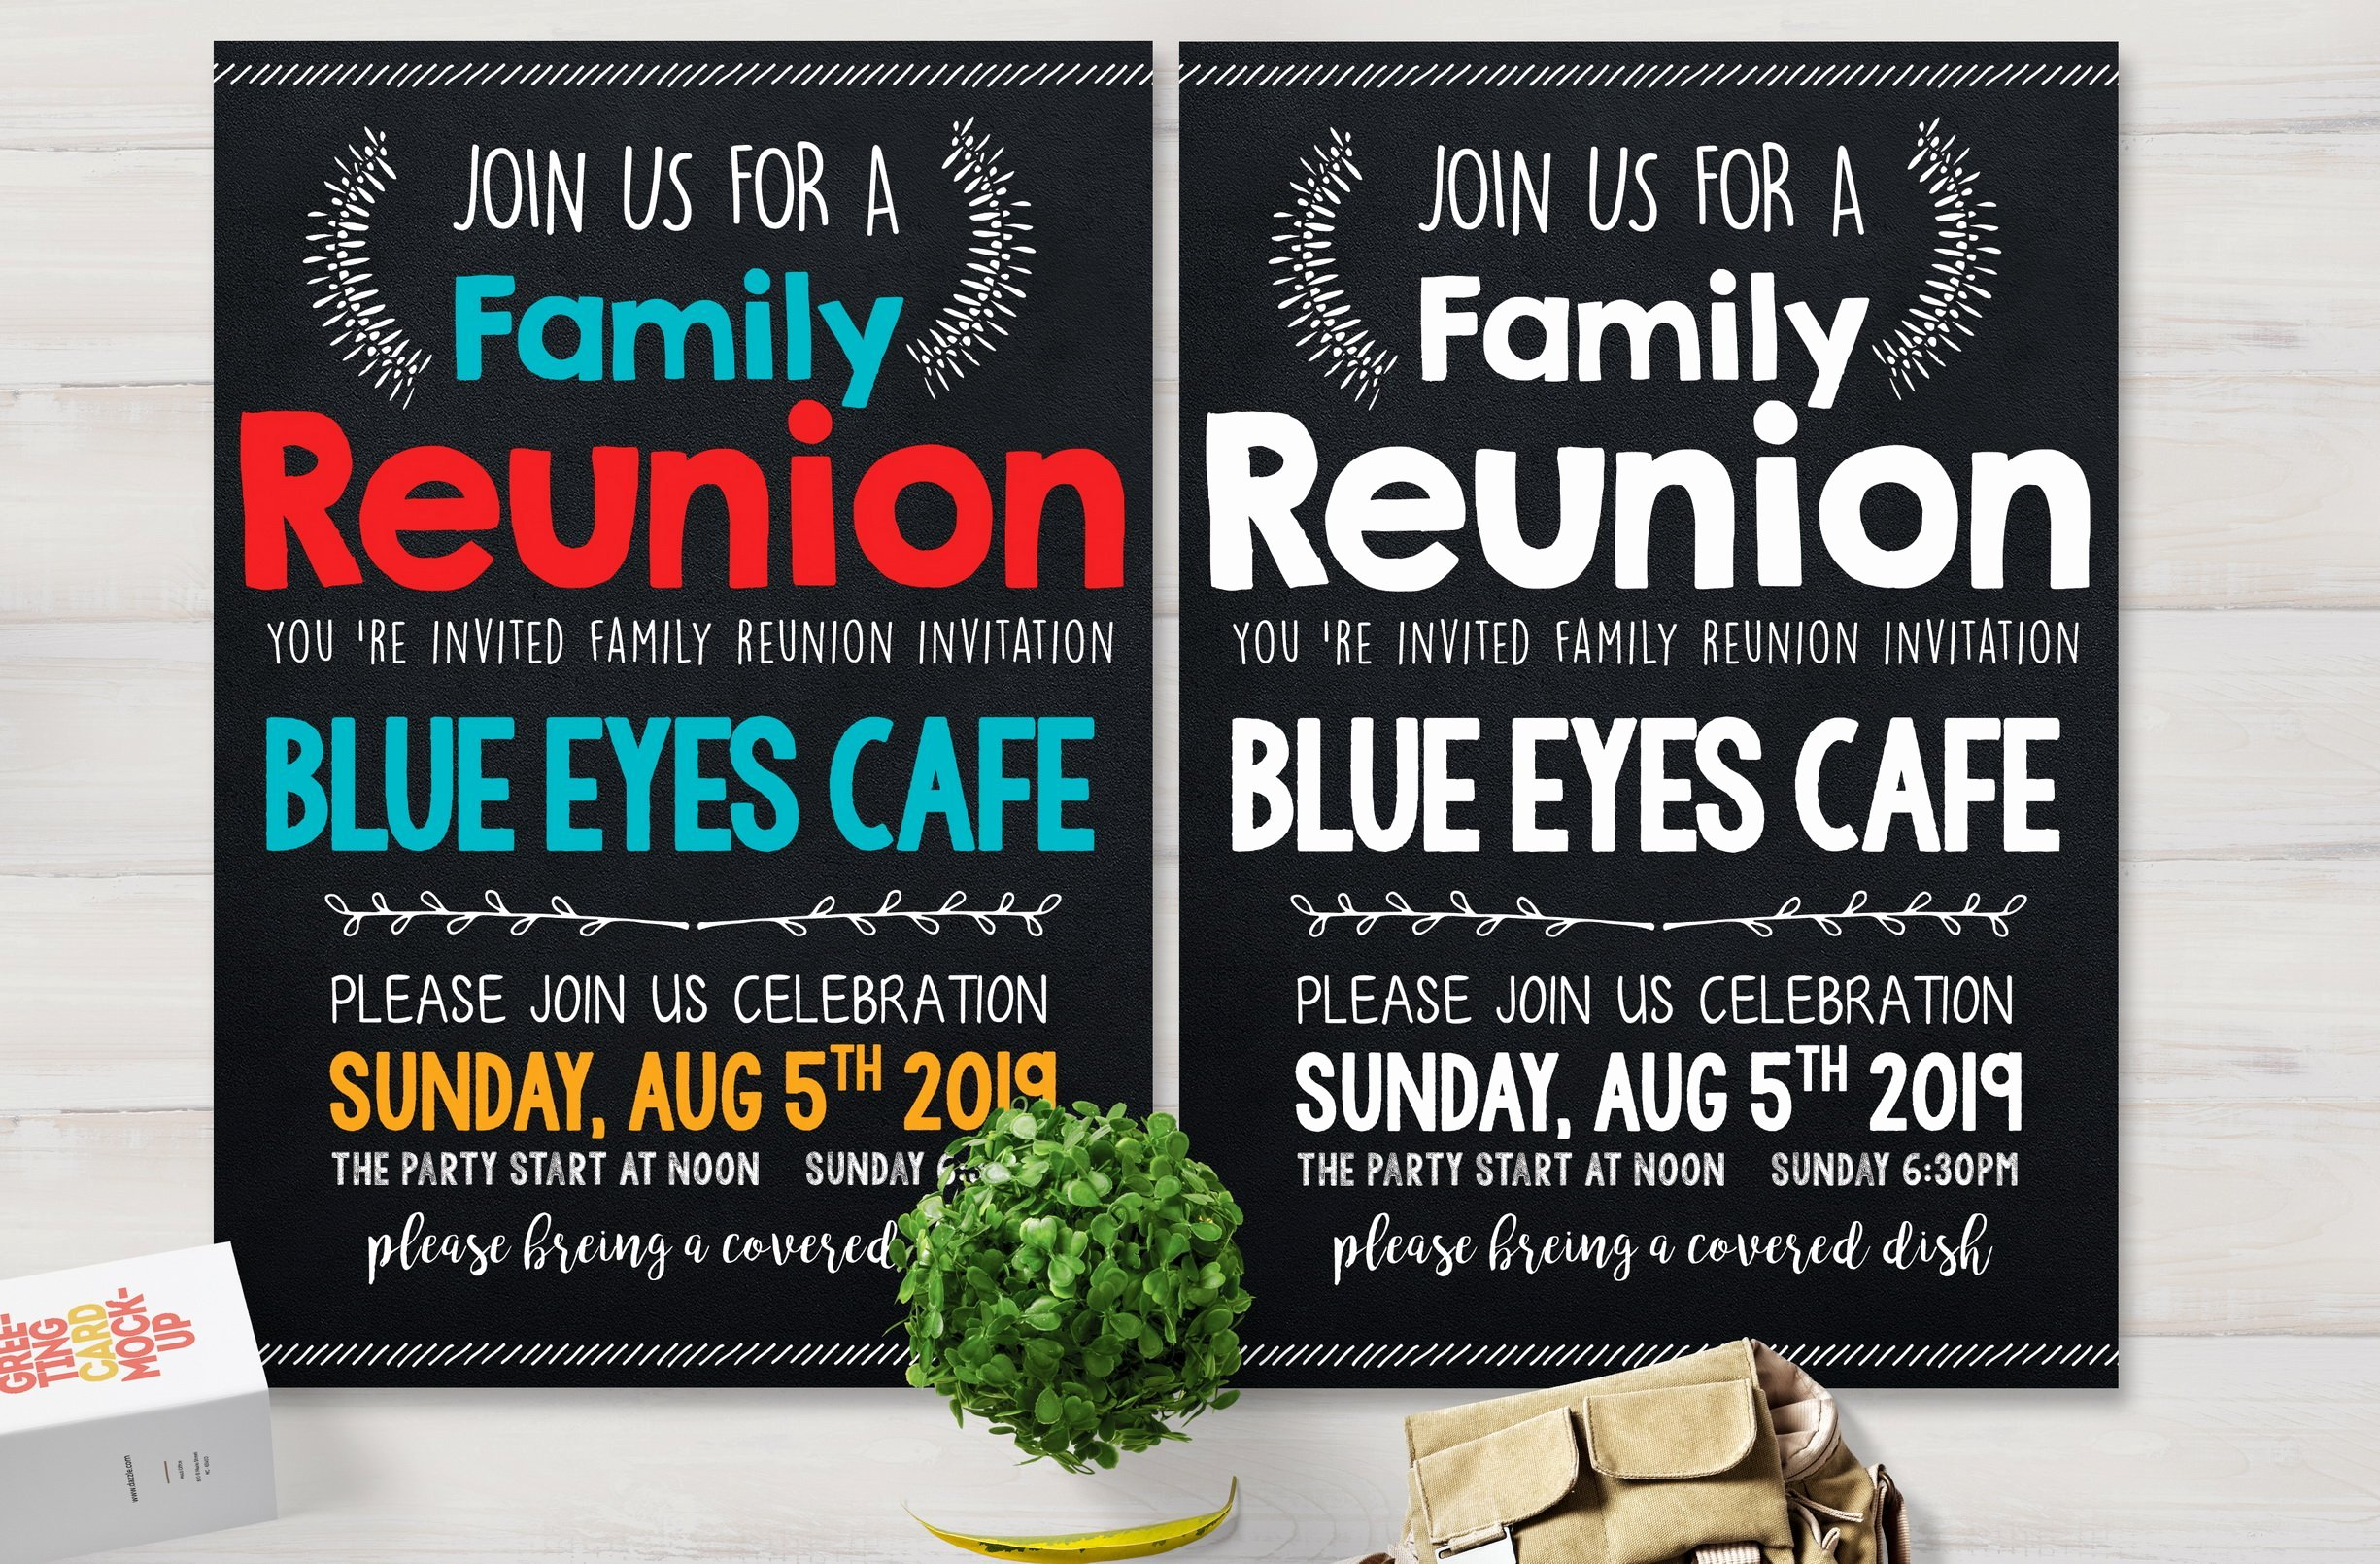 Family Reunion Flyer Template Inspirational Family Reunion Party Flyer Card Templates Creative Market